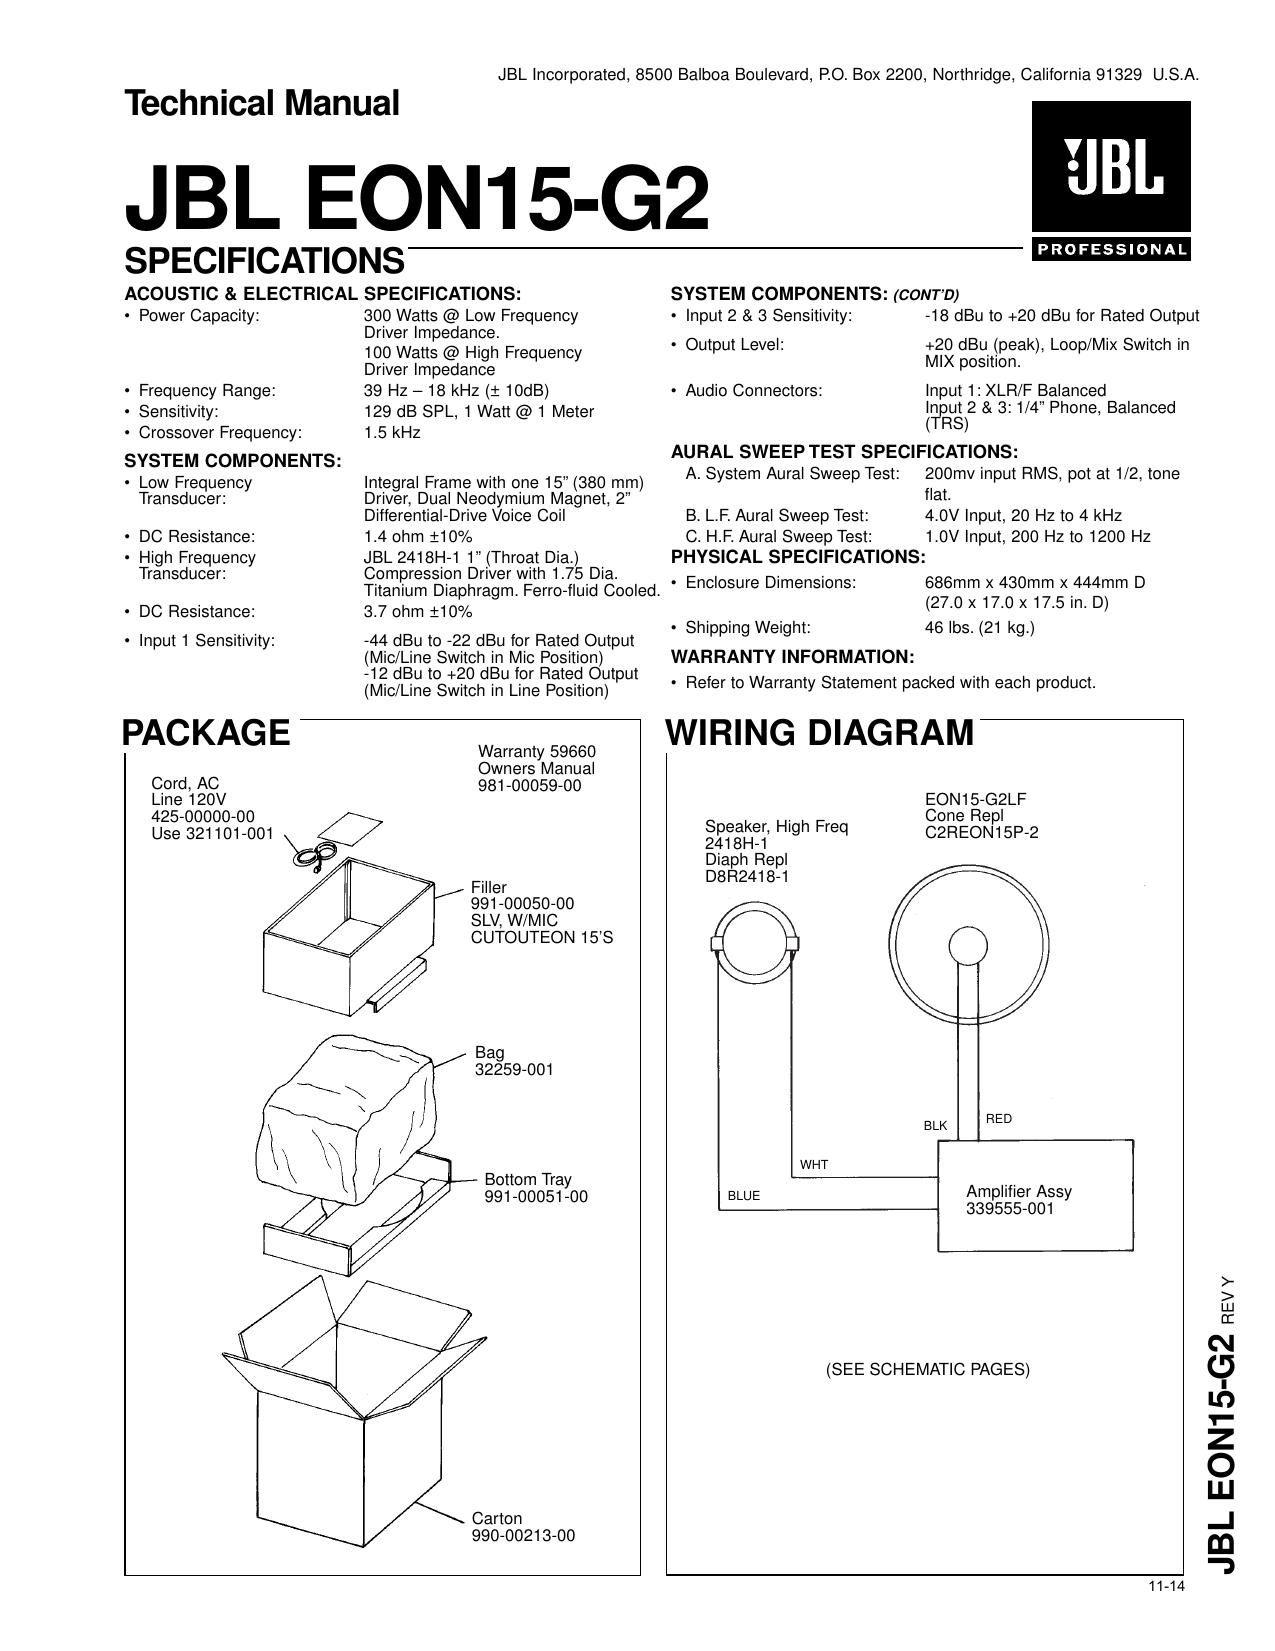 Jbl Manual Sb400 Powered Soundbar Schematic Circuit Diagram Electro Background Image Array Eon 15 G2 Owners Rh Audioservicemanuals